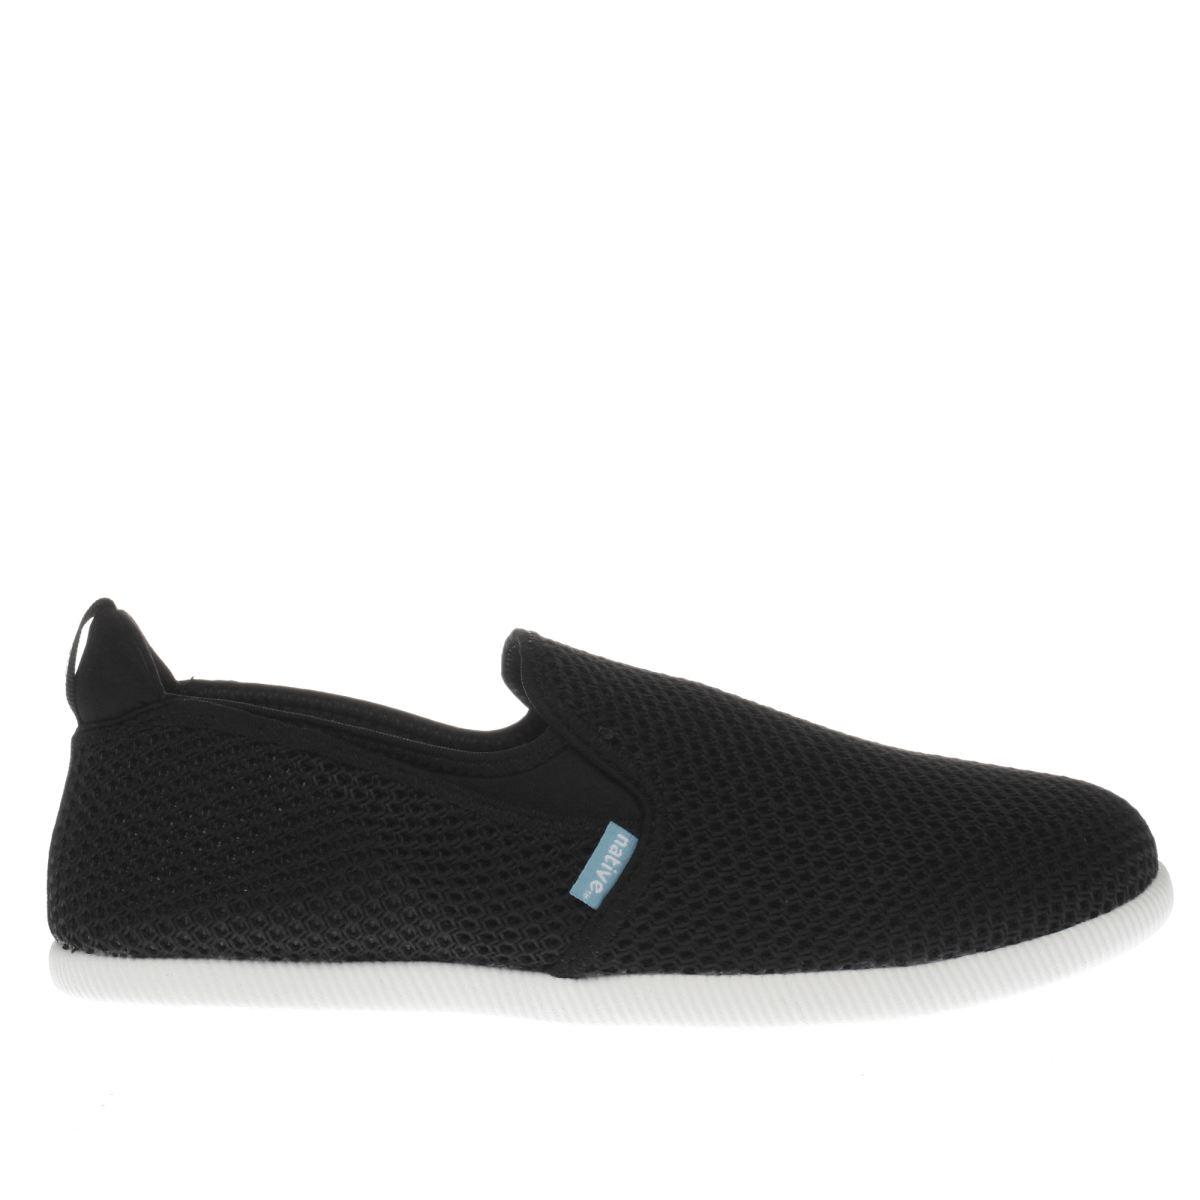 Native Native Black Cruz Shoes